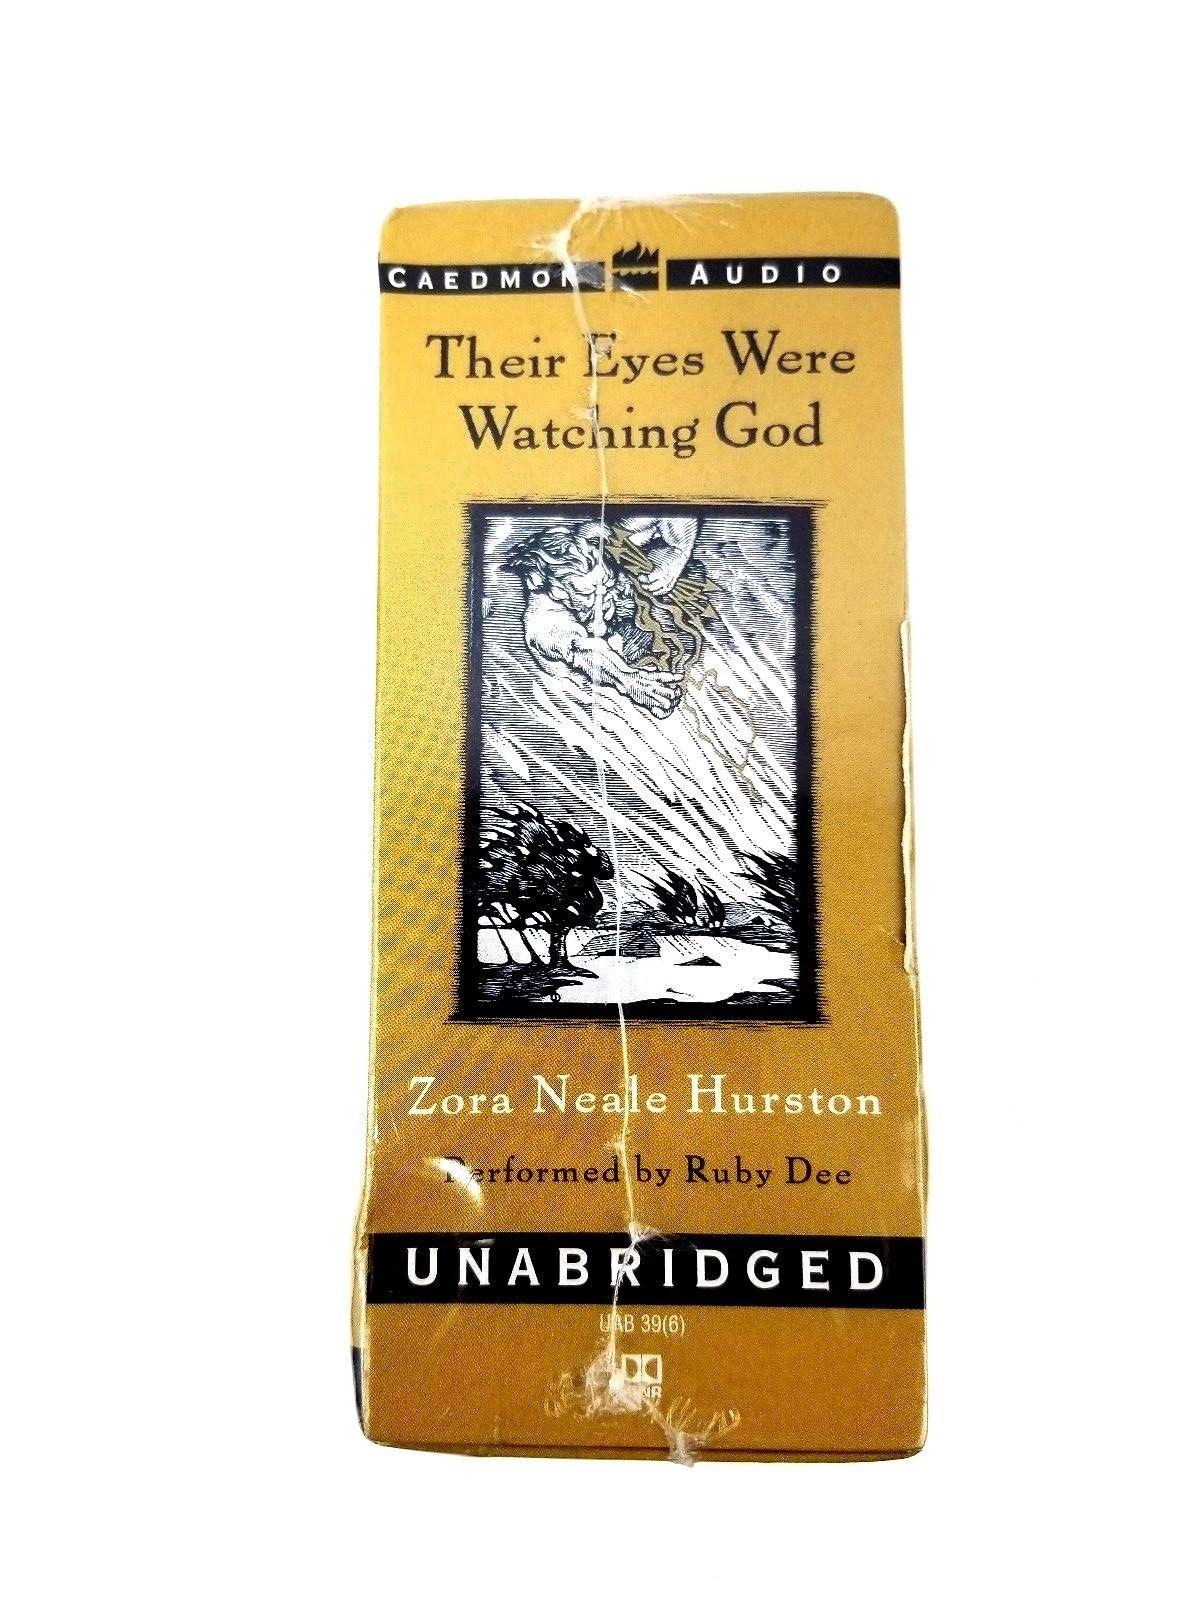 Their Eyes Were Watching God Zora Neale Hurston Audio Cassettes Mules & Men New